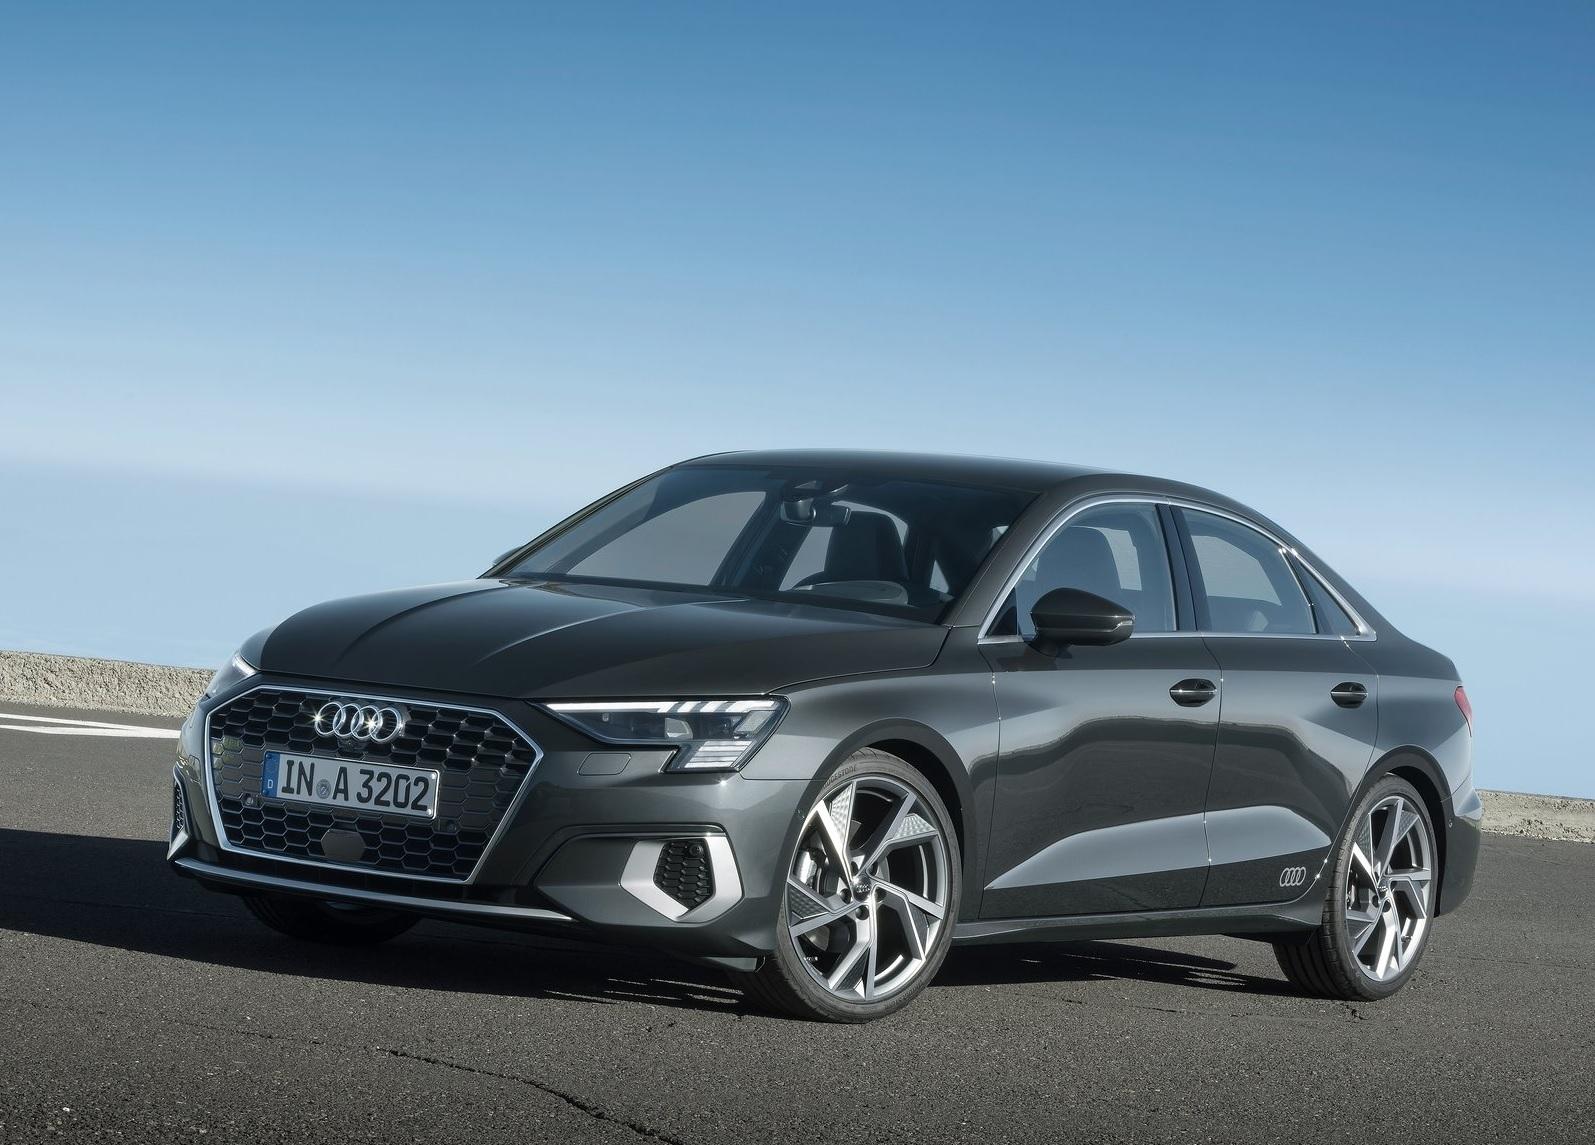 Audi A3 Sedan 2021 deve chegar ao Brasil na virada do próximo ano